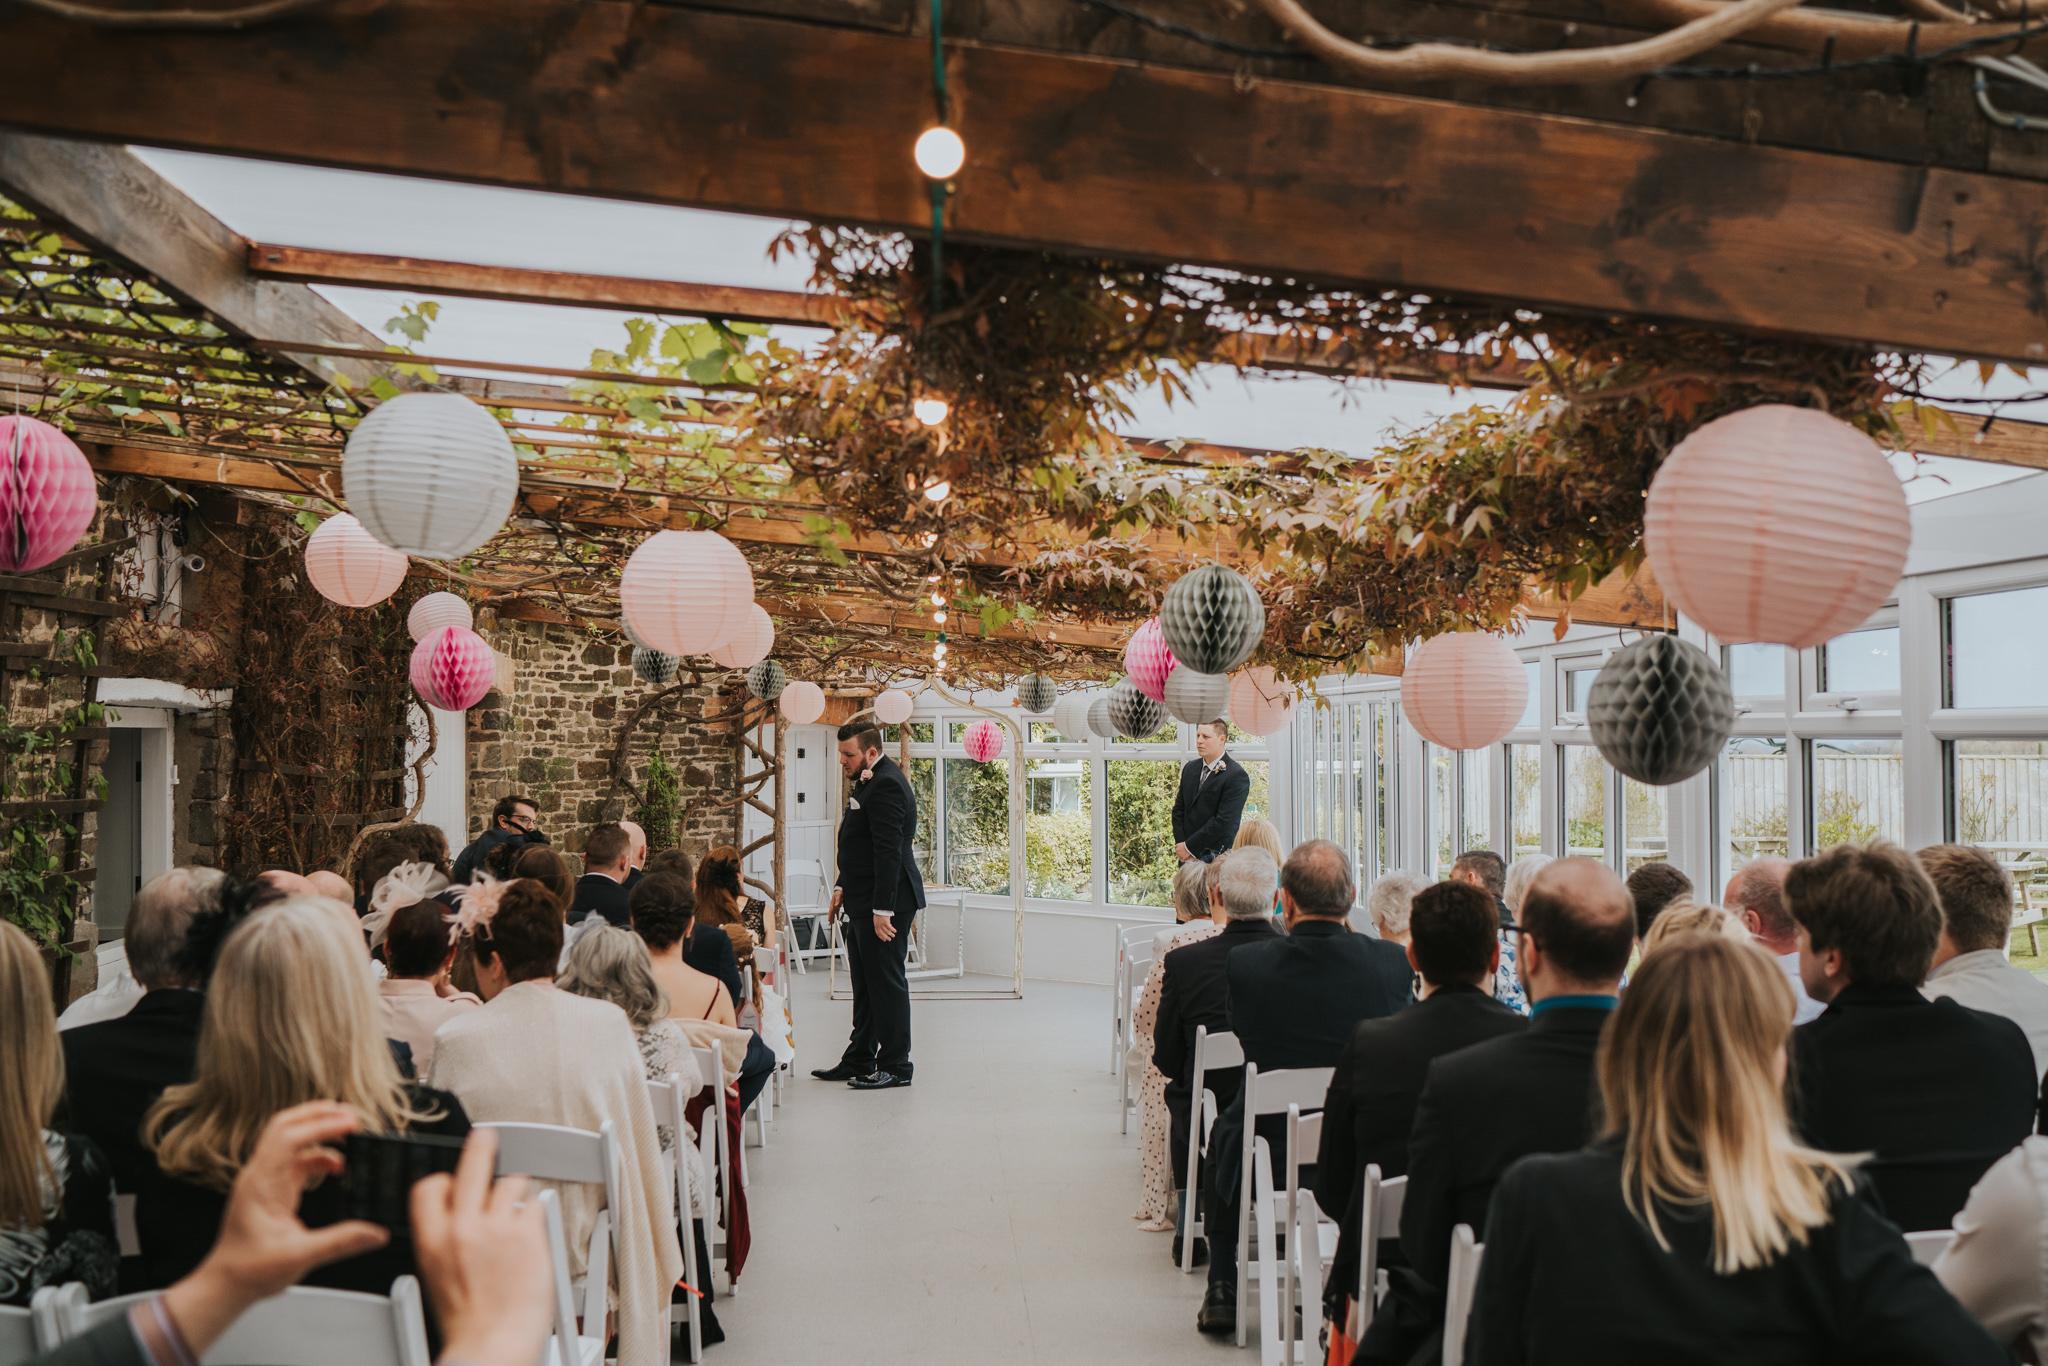 grace-sam-old-barn-clovelly-devon-wedding-photographer-grace-elizabeth-essex-suffolk-norfolk-wedding-photographer (35 of 132).jpg